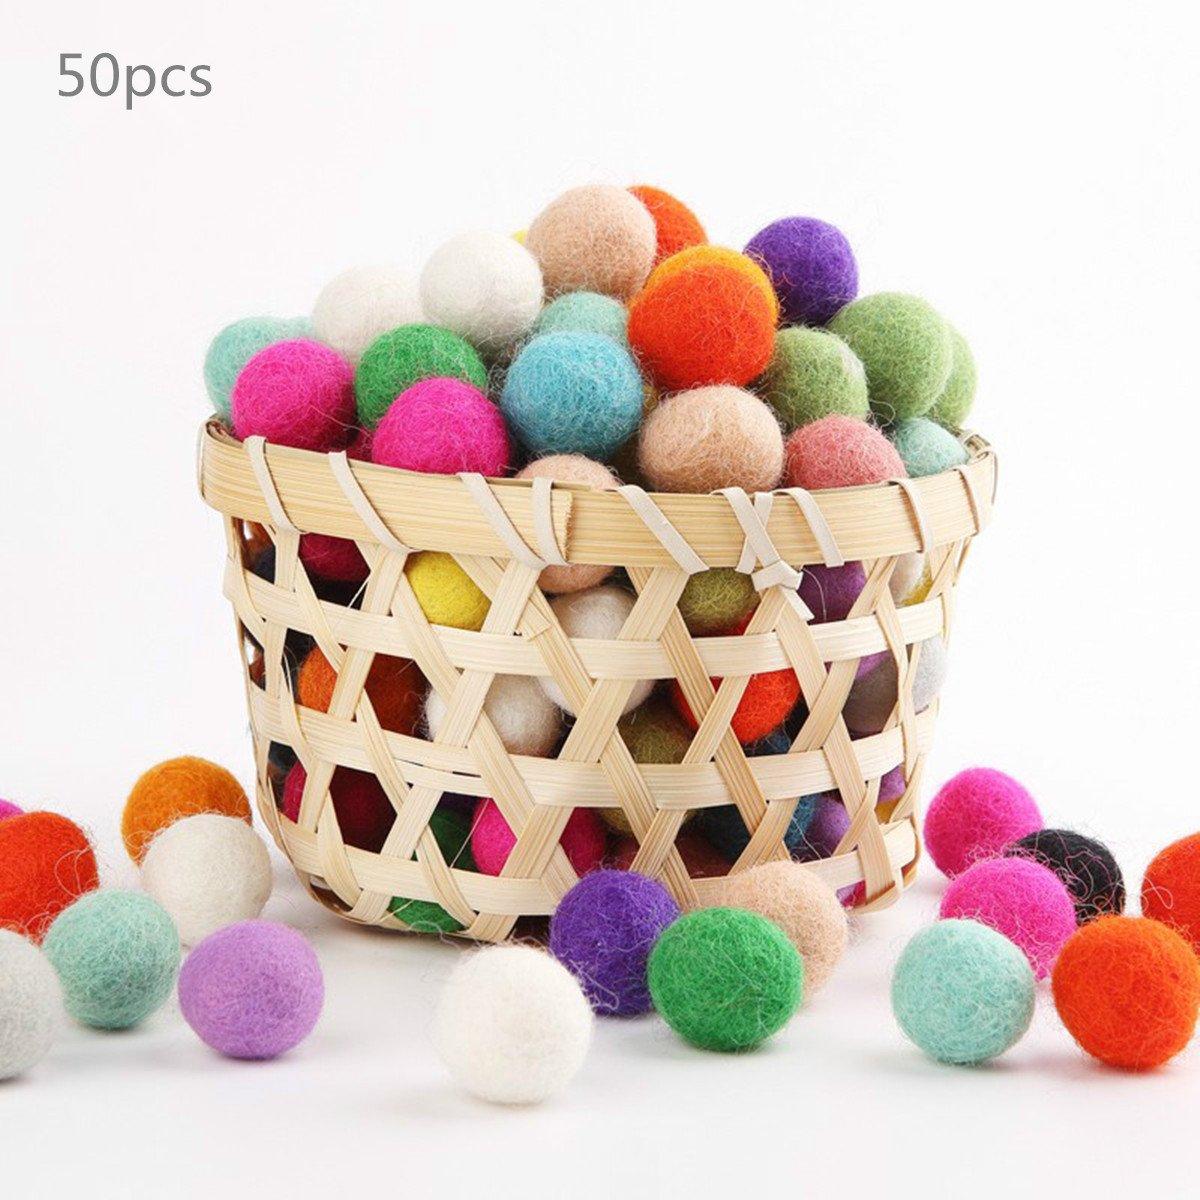 Baby Love Home Wool Felt Beads 50pc 100% Wool 2cm Flocking Ball DIY Christmas Decor Mix Color Wool Balls Holiday Theme